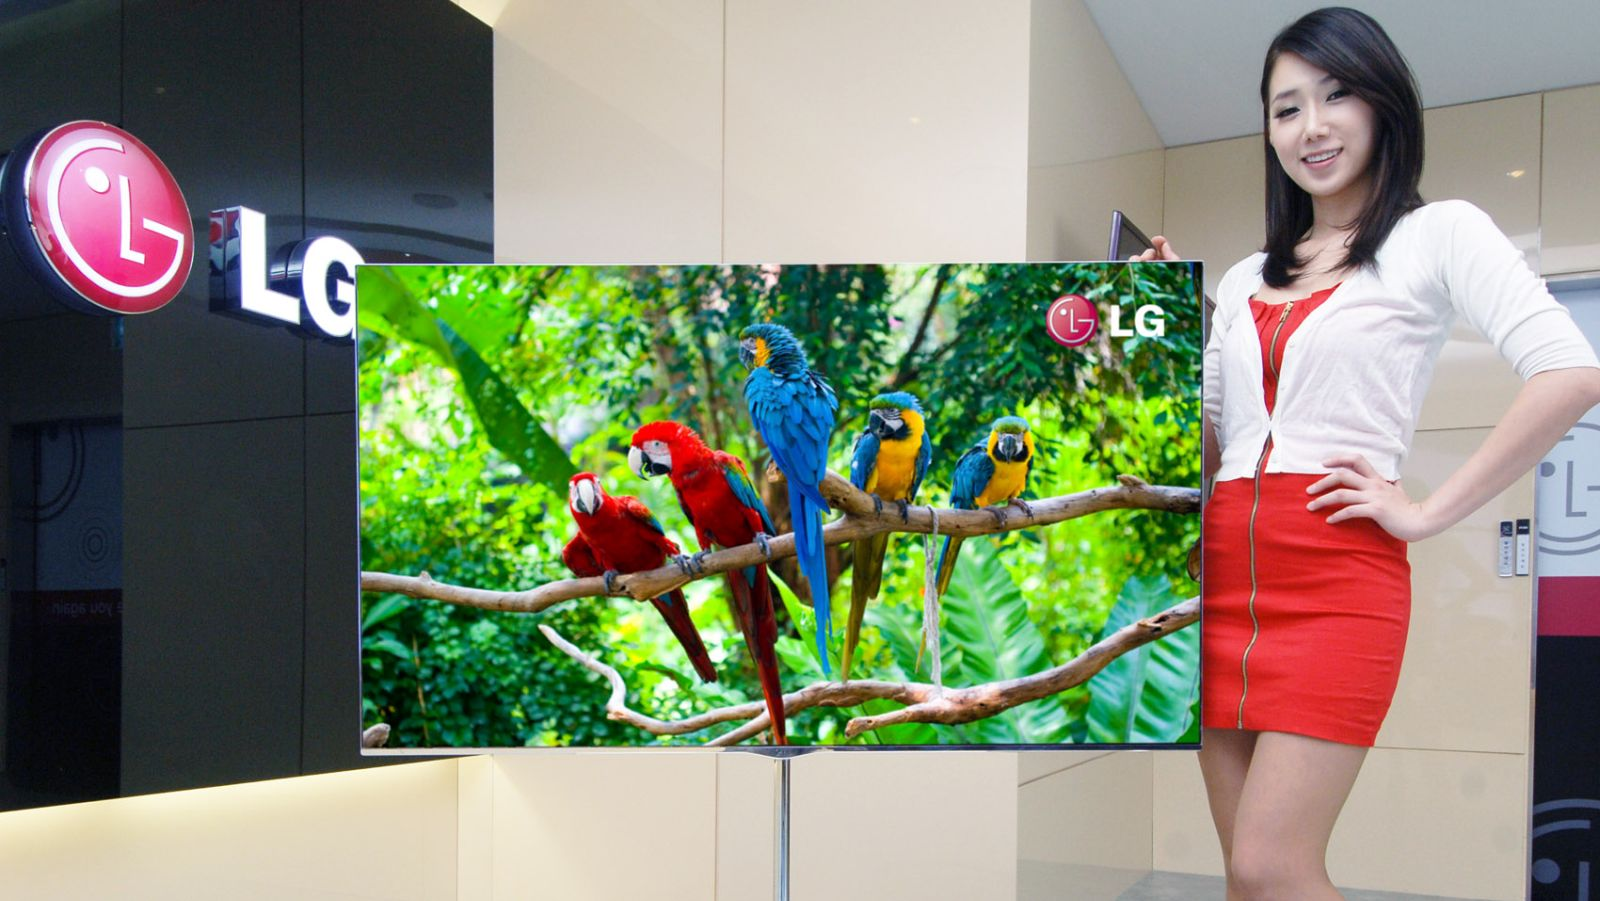 LG OLED TV LG Electronics